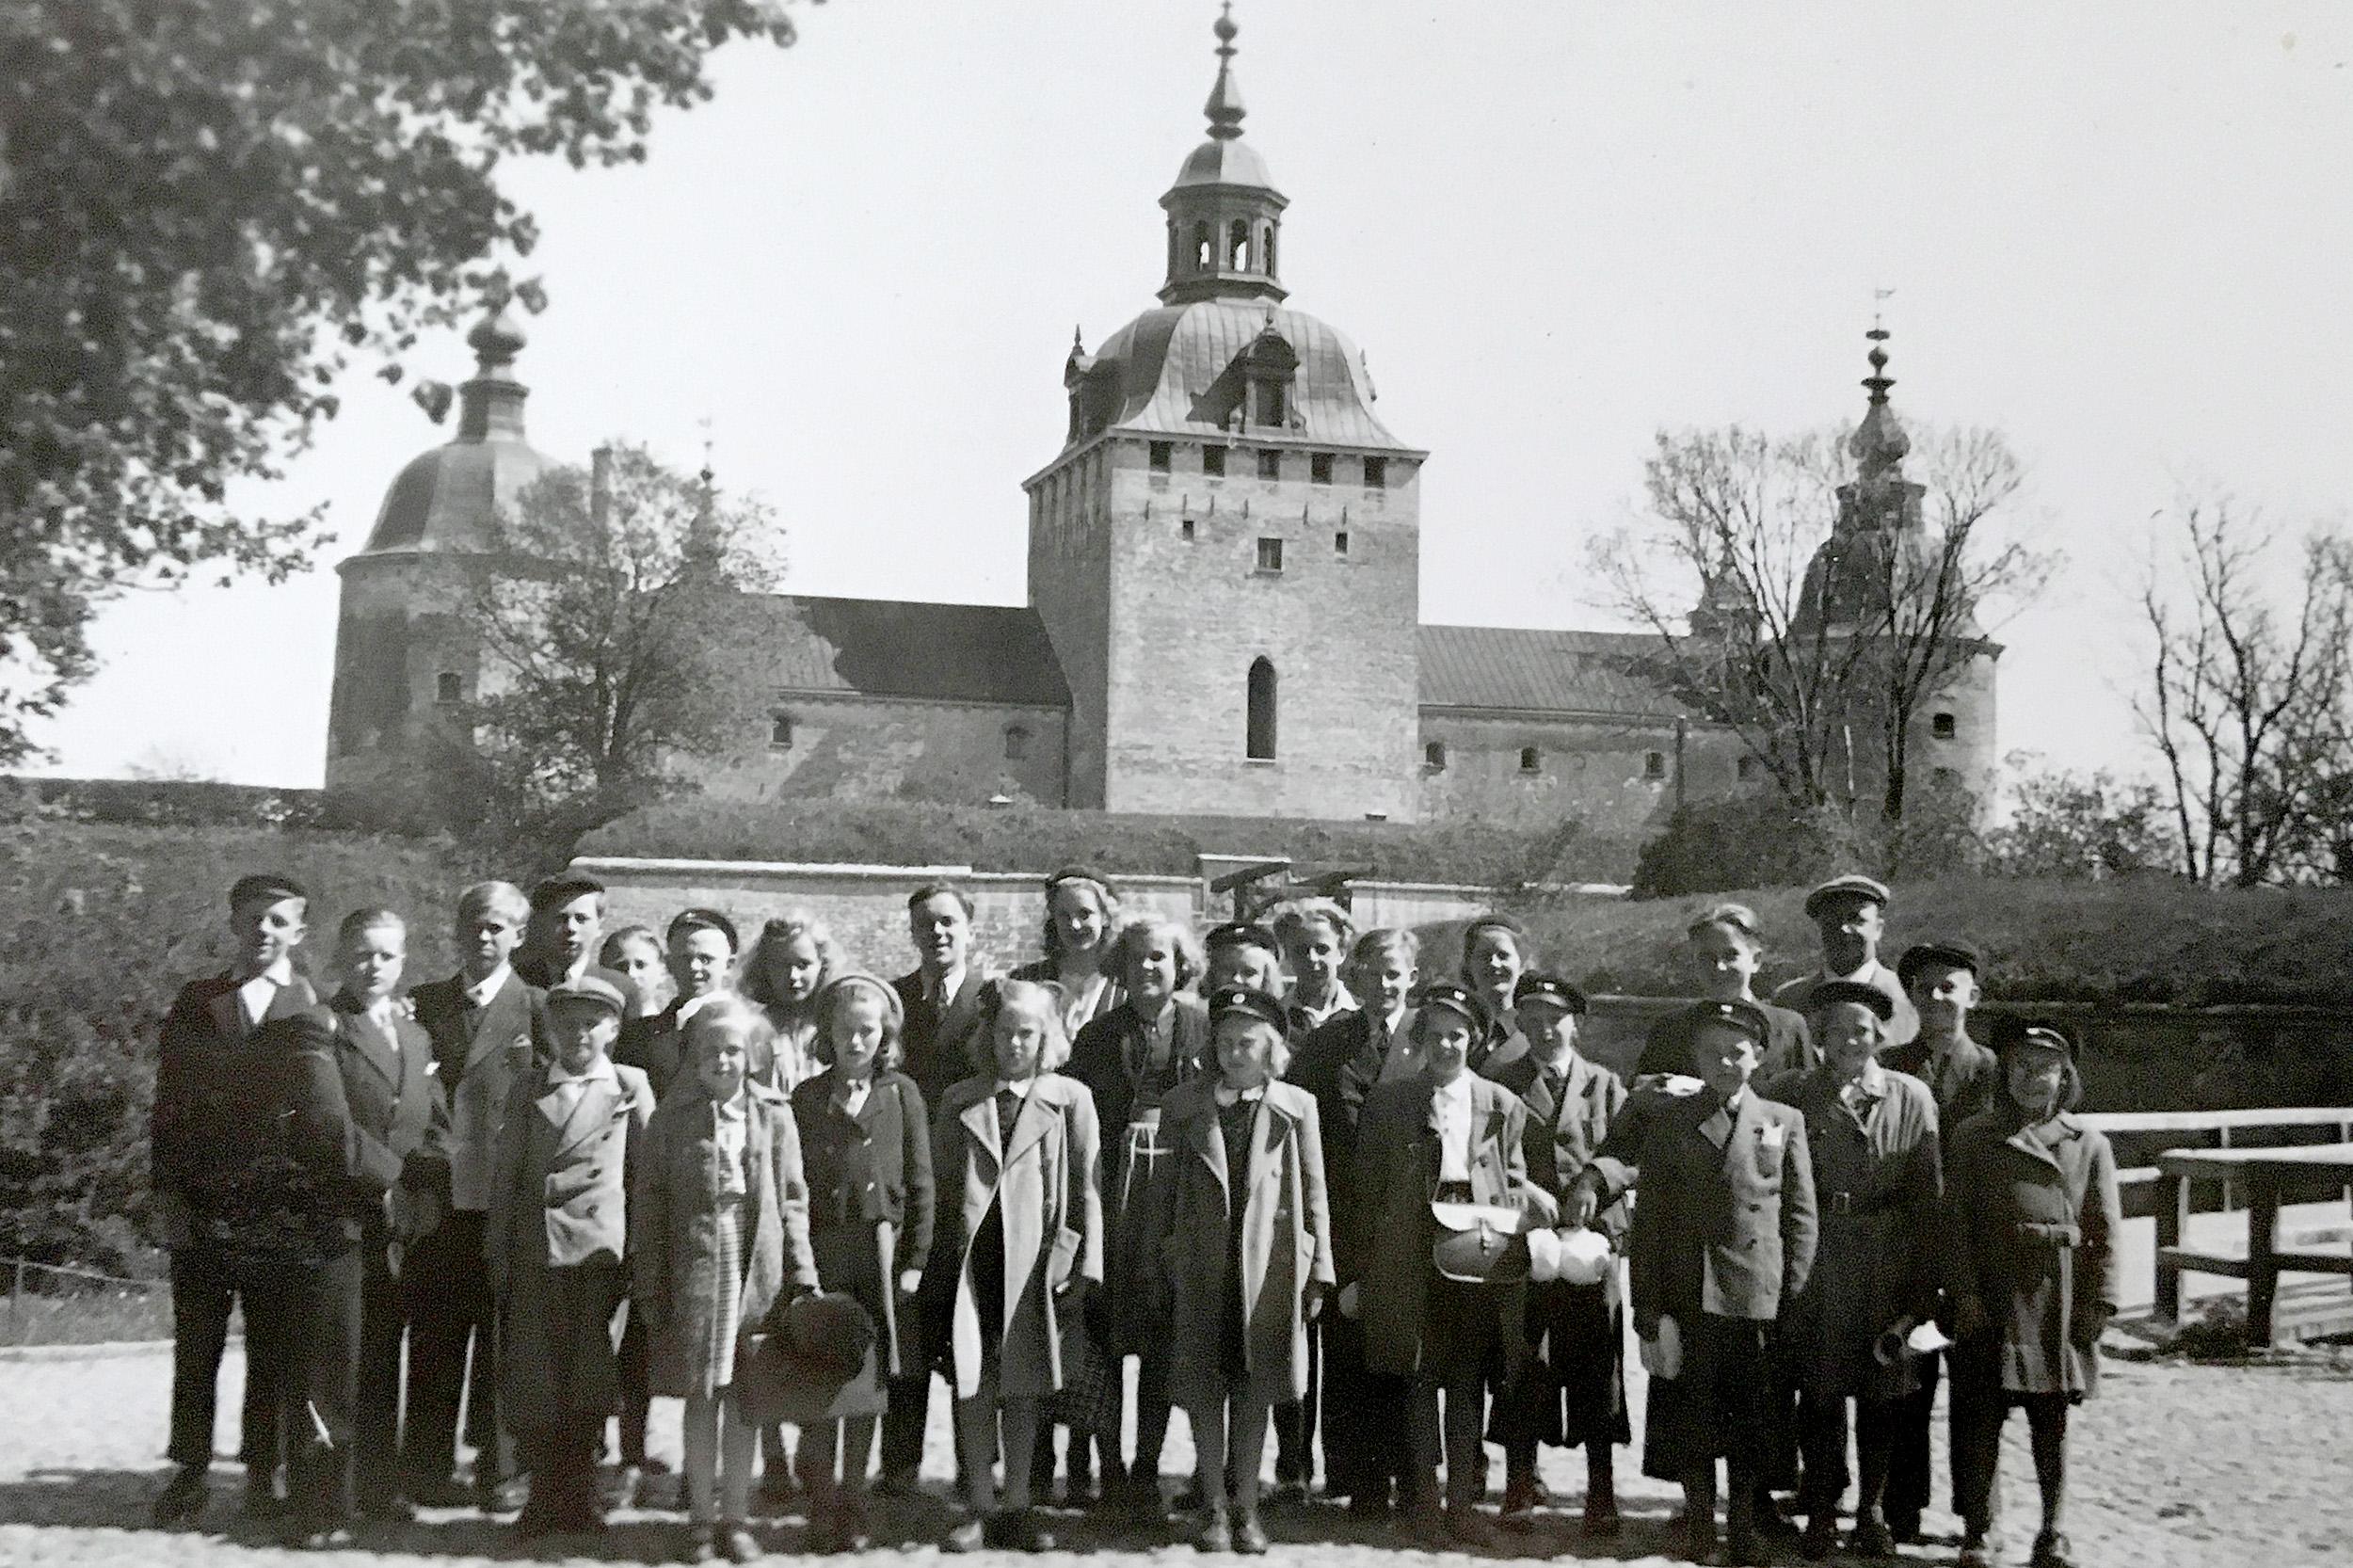 Pappa skolresa kalmar slott 1944